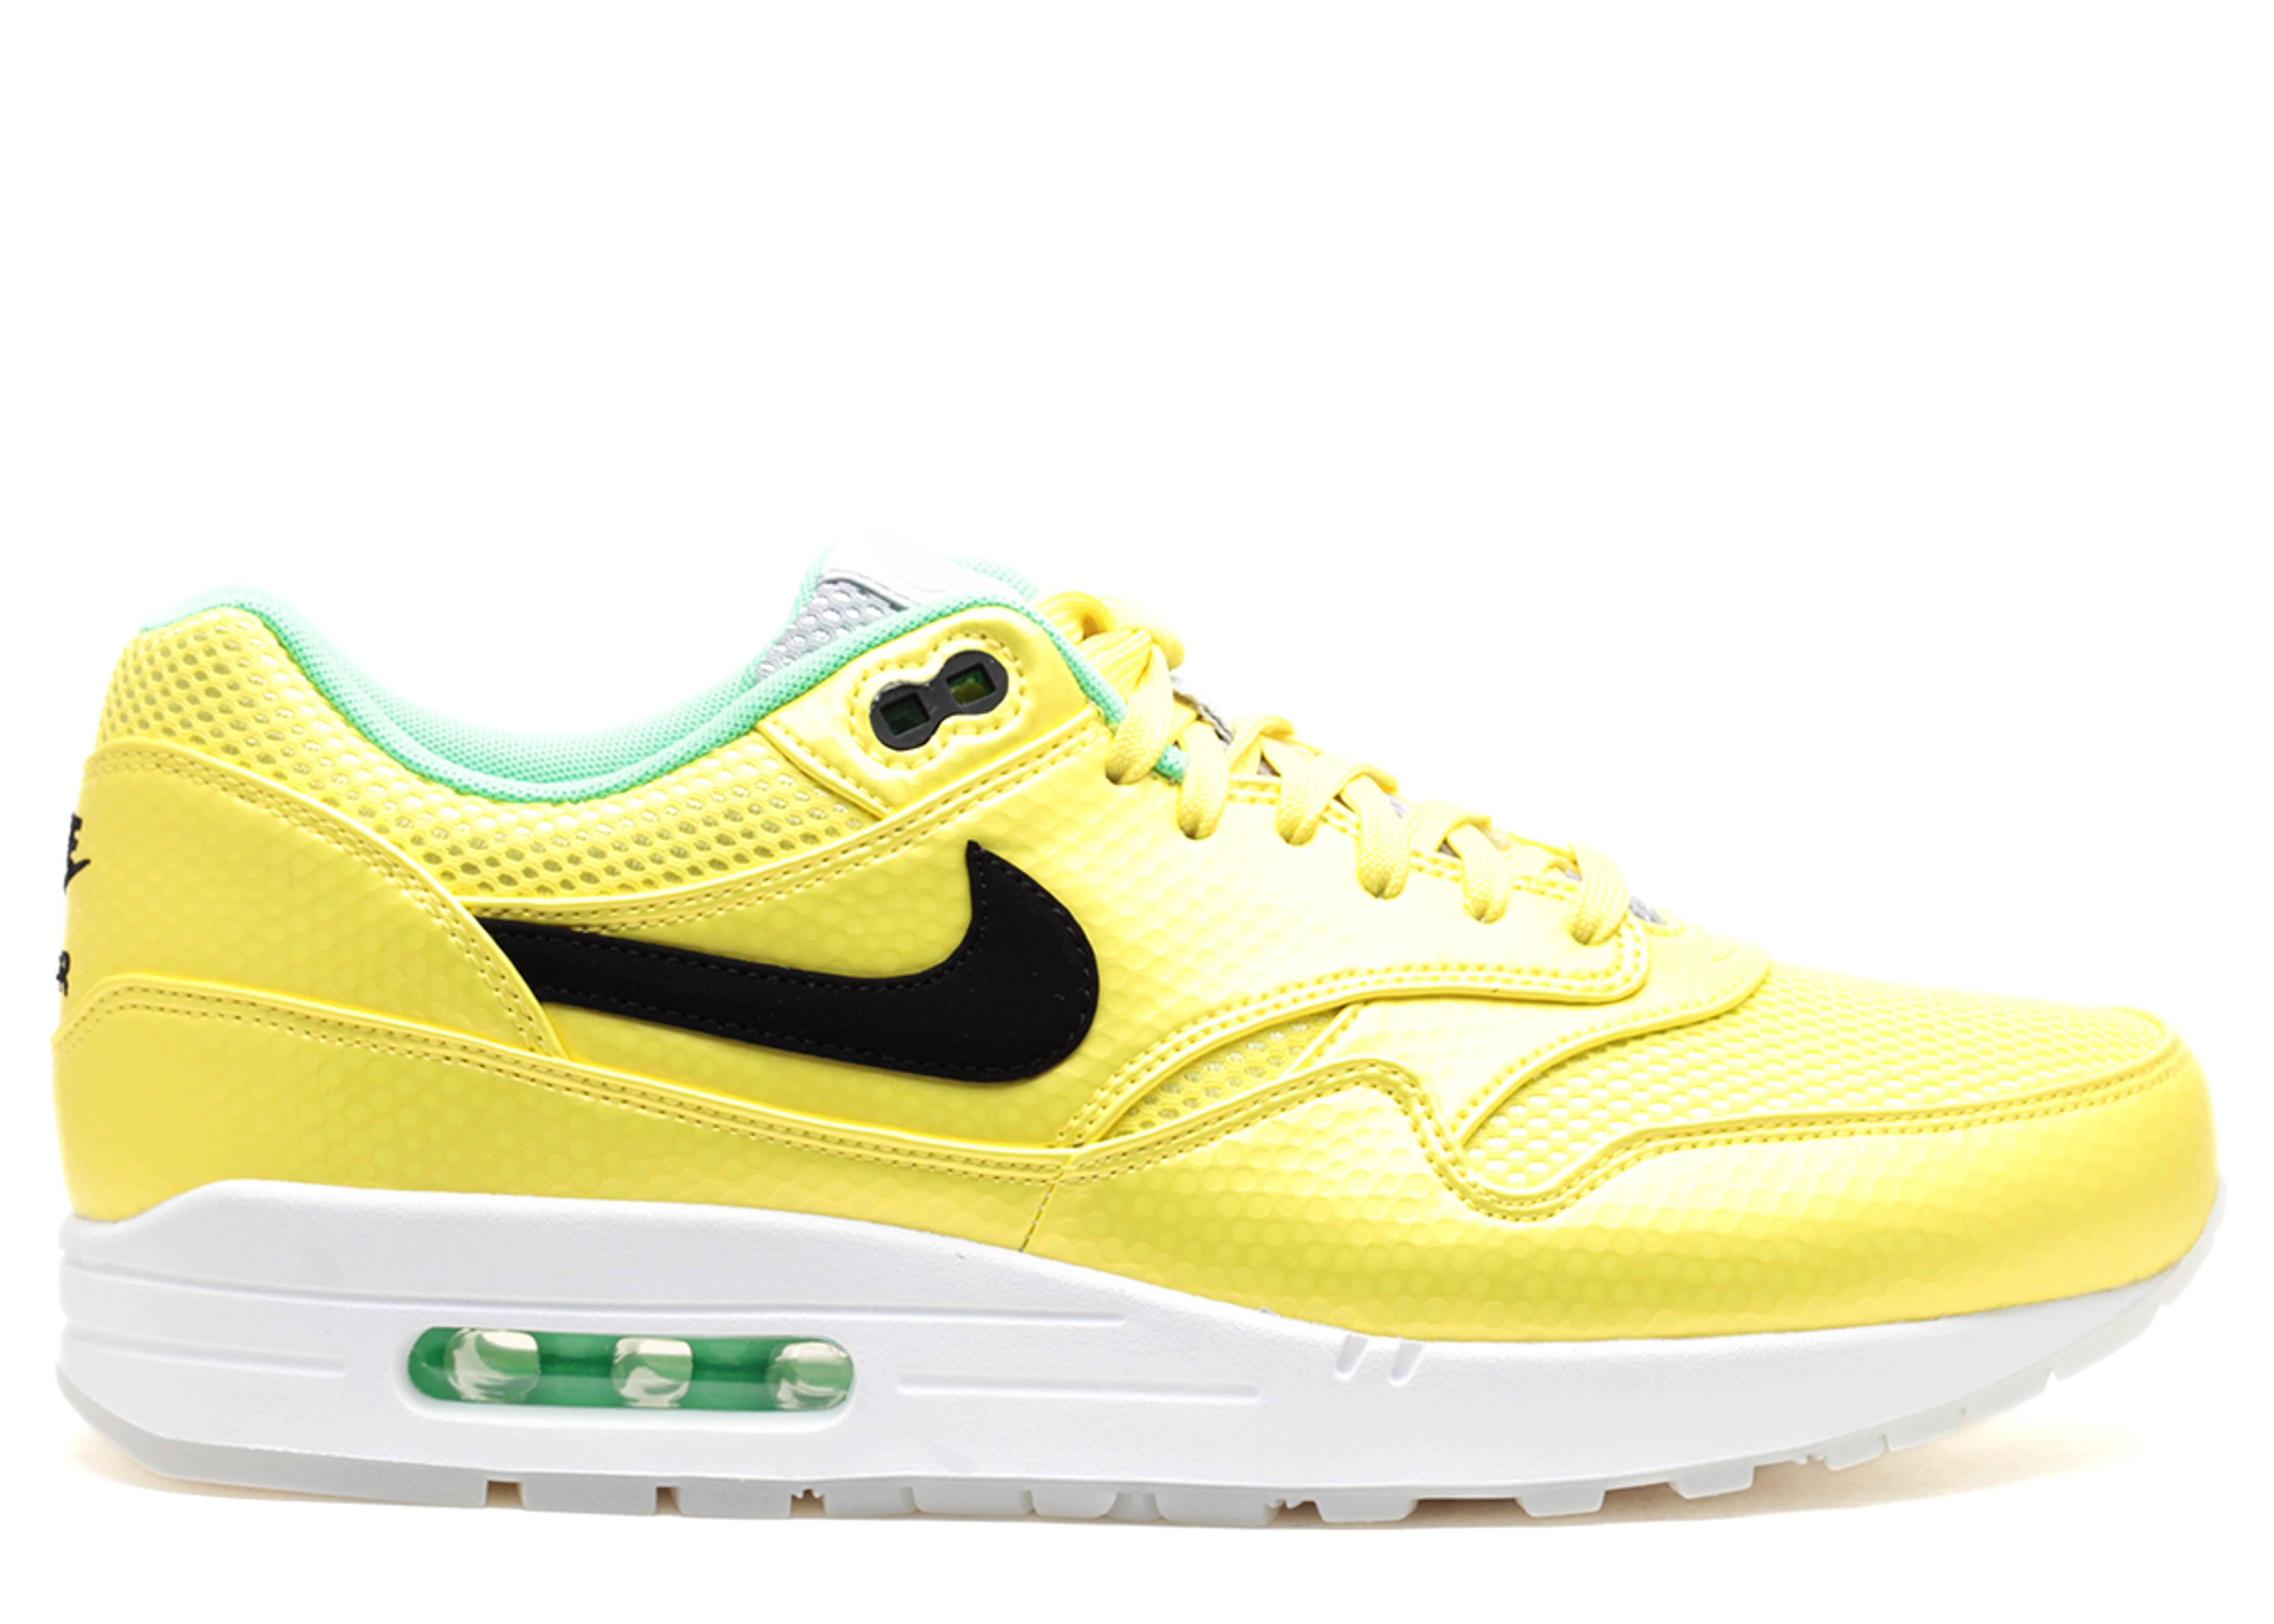 Nike Air Max 1 FB Premium QS Mercurial Pack Vibrant Yellow Neo Lime X5t5635